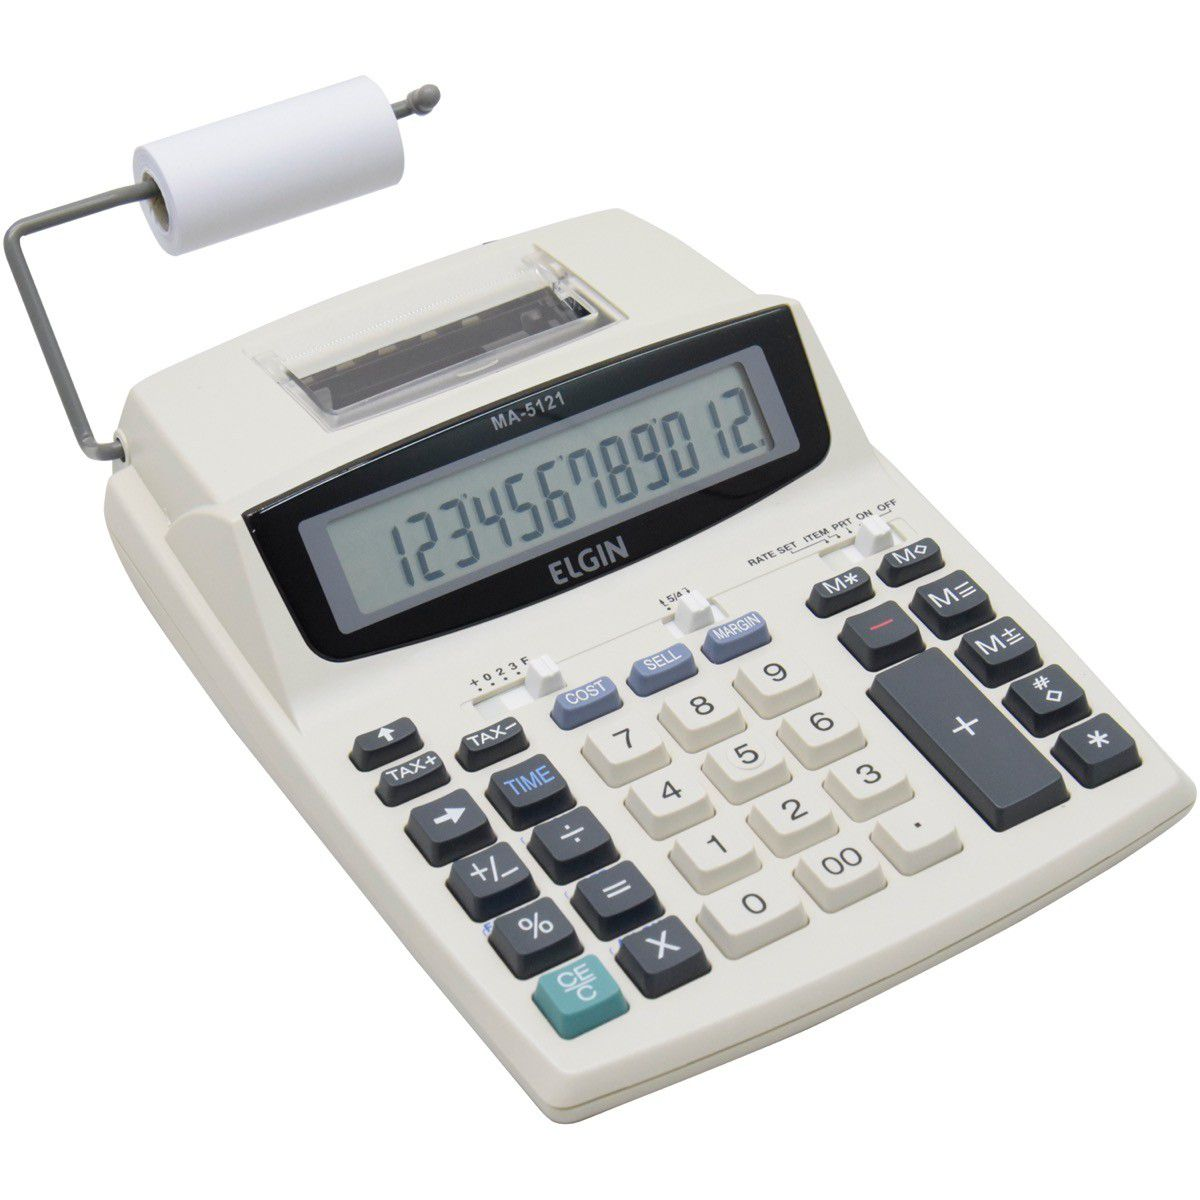 Calculadora Eletronica De Mesa C/Bobina C/Adaptador Elgin